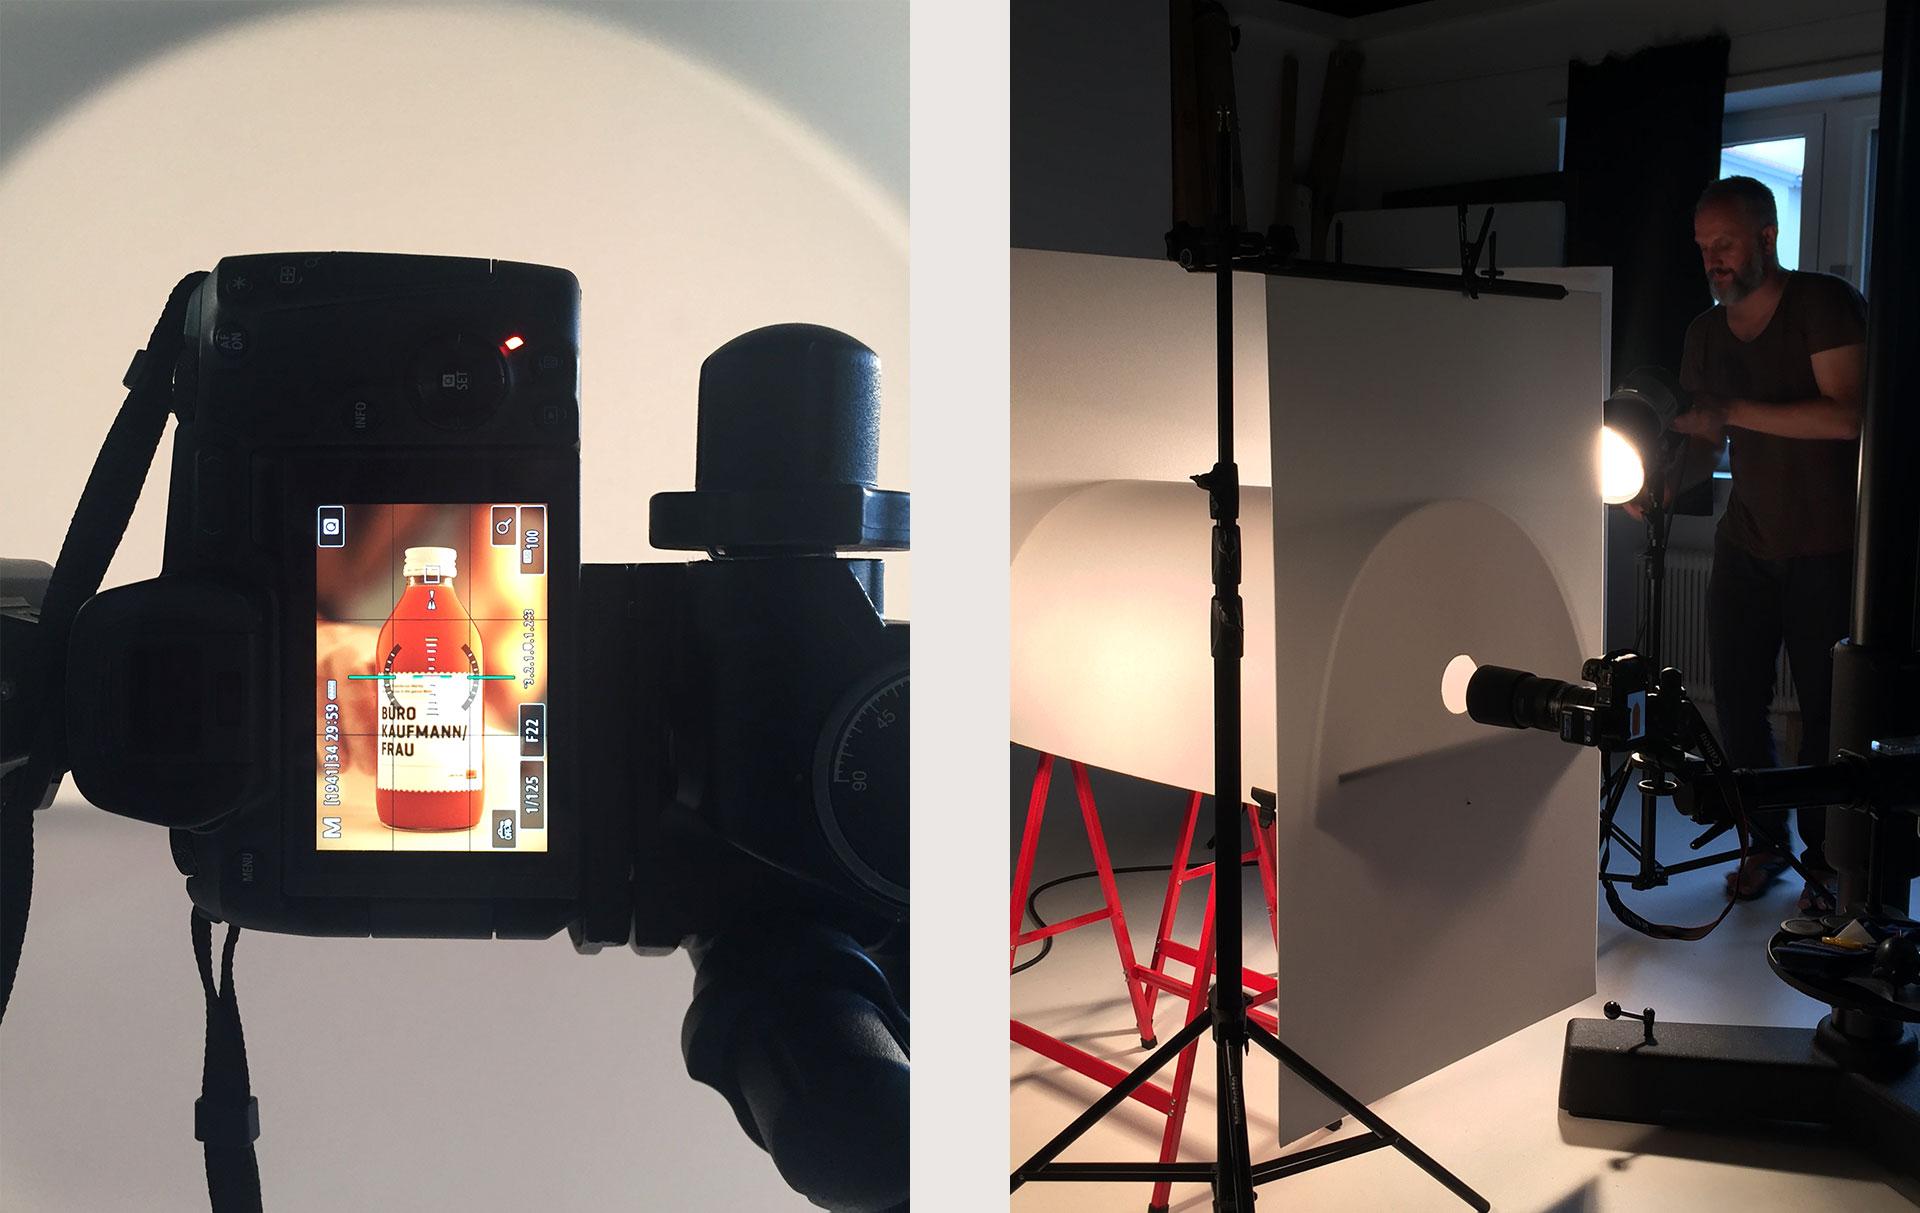 Etiketten CARINI, Shooting, Making-Of, Bernhard Hafele, viergestalten